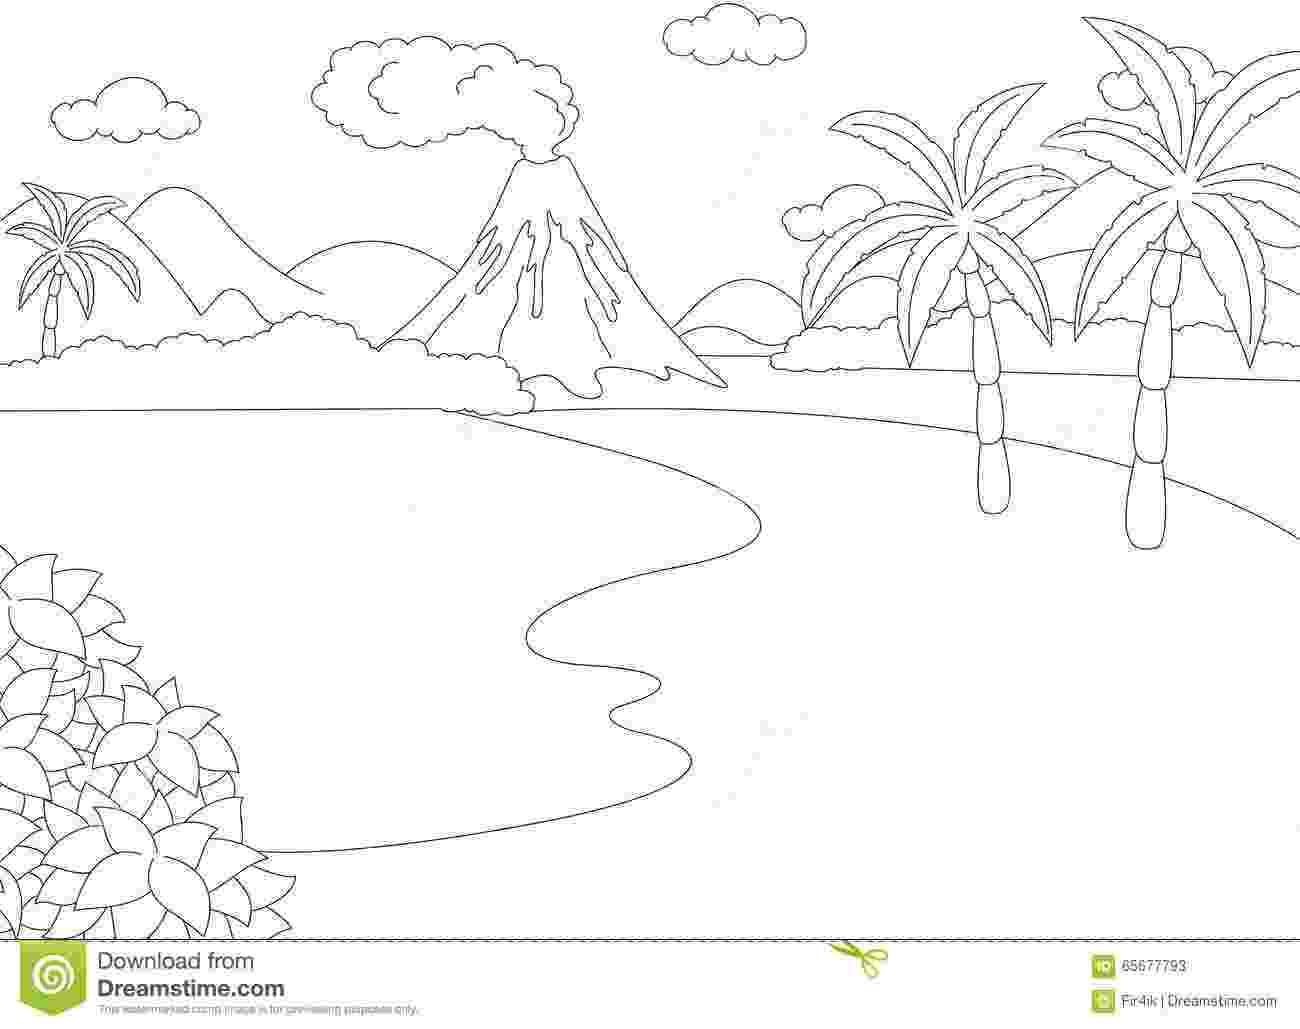 laguna para colorear eruzione vulcanica libro da colorare per i bambini para colorear laguna